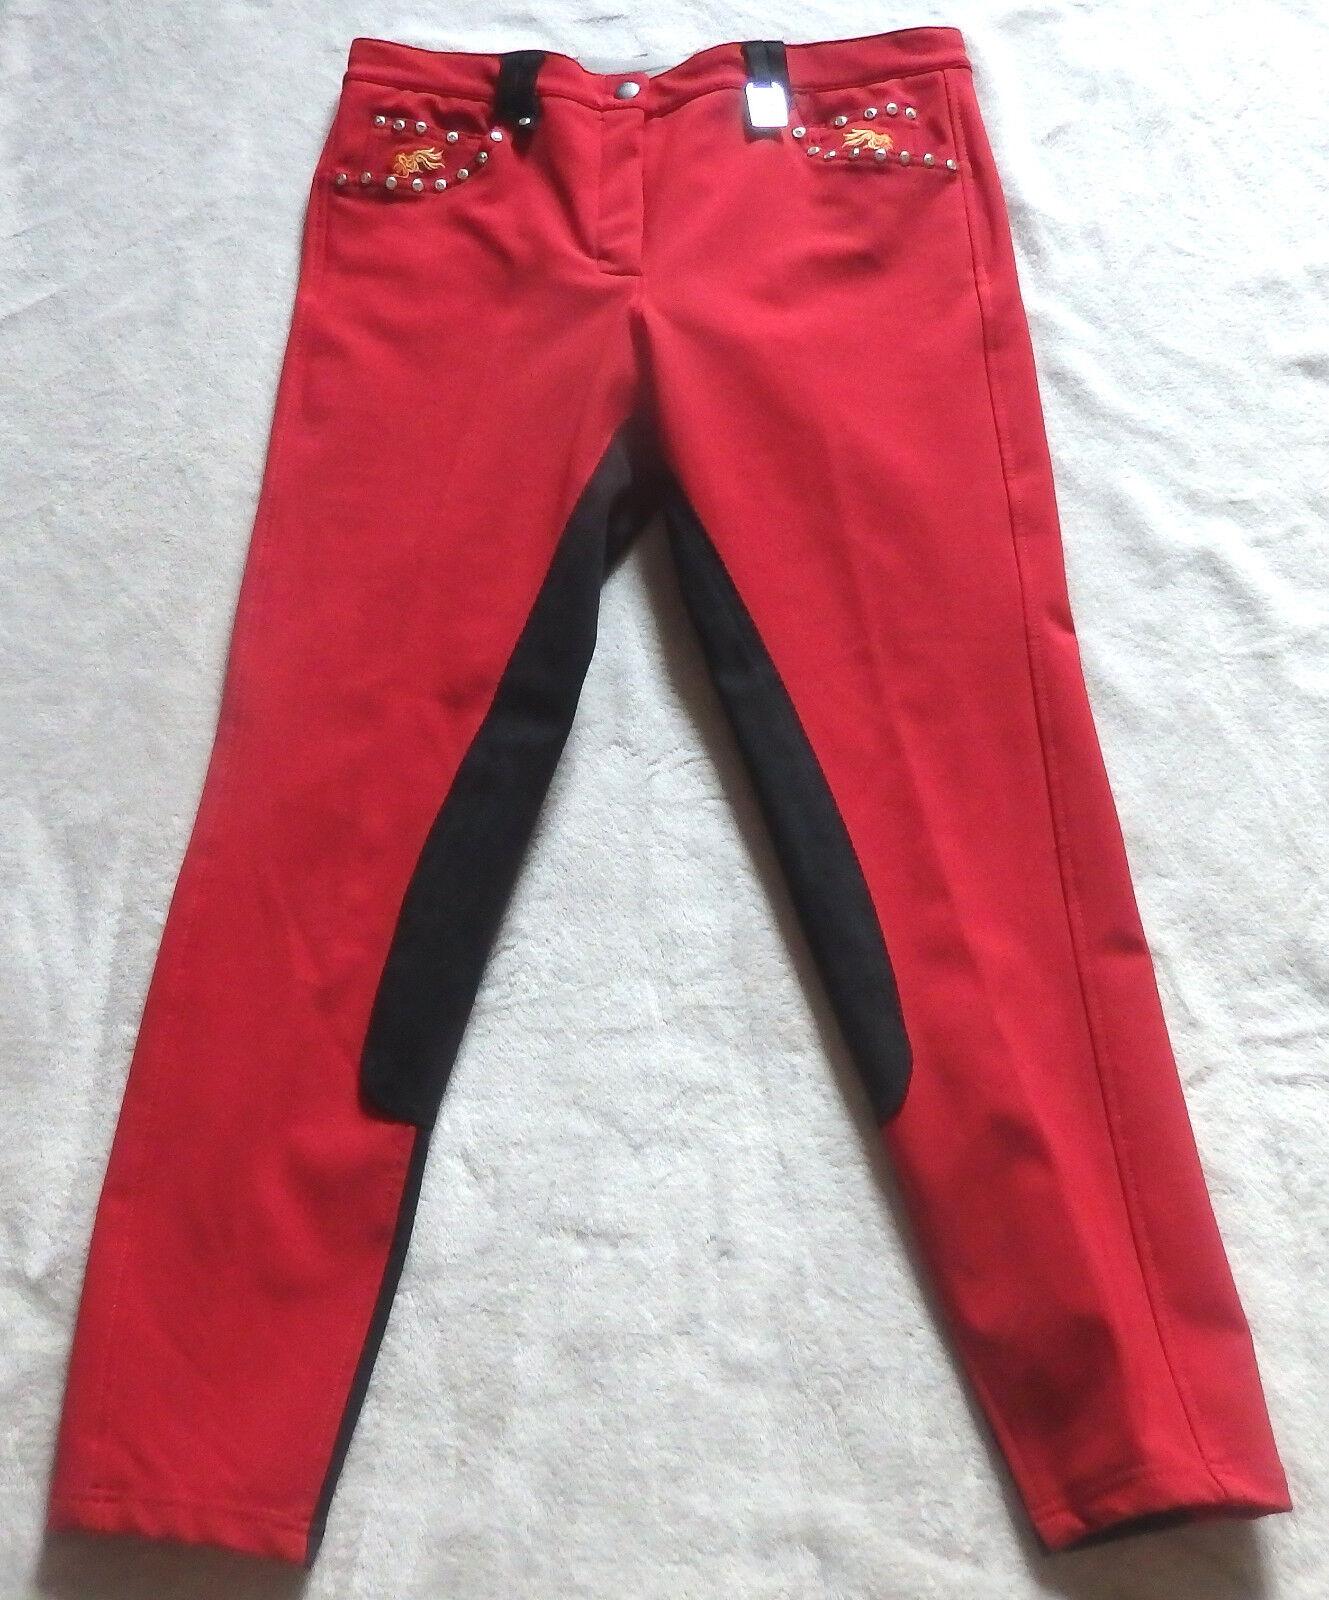 Kyron Damen Reithose LEXY, 3 3 3 4 Vollbesatz,rot, Gr. 42, (90) 888a05